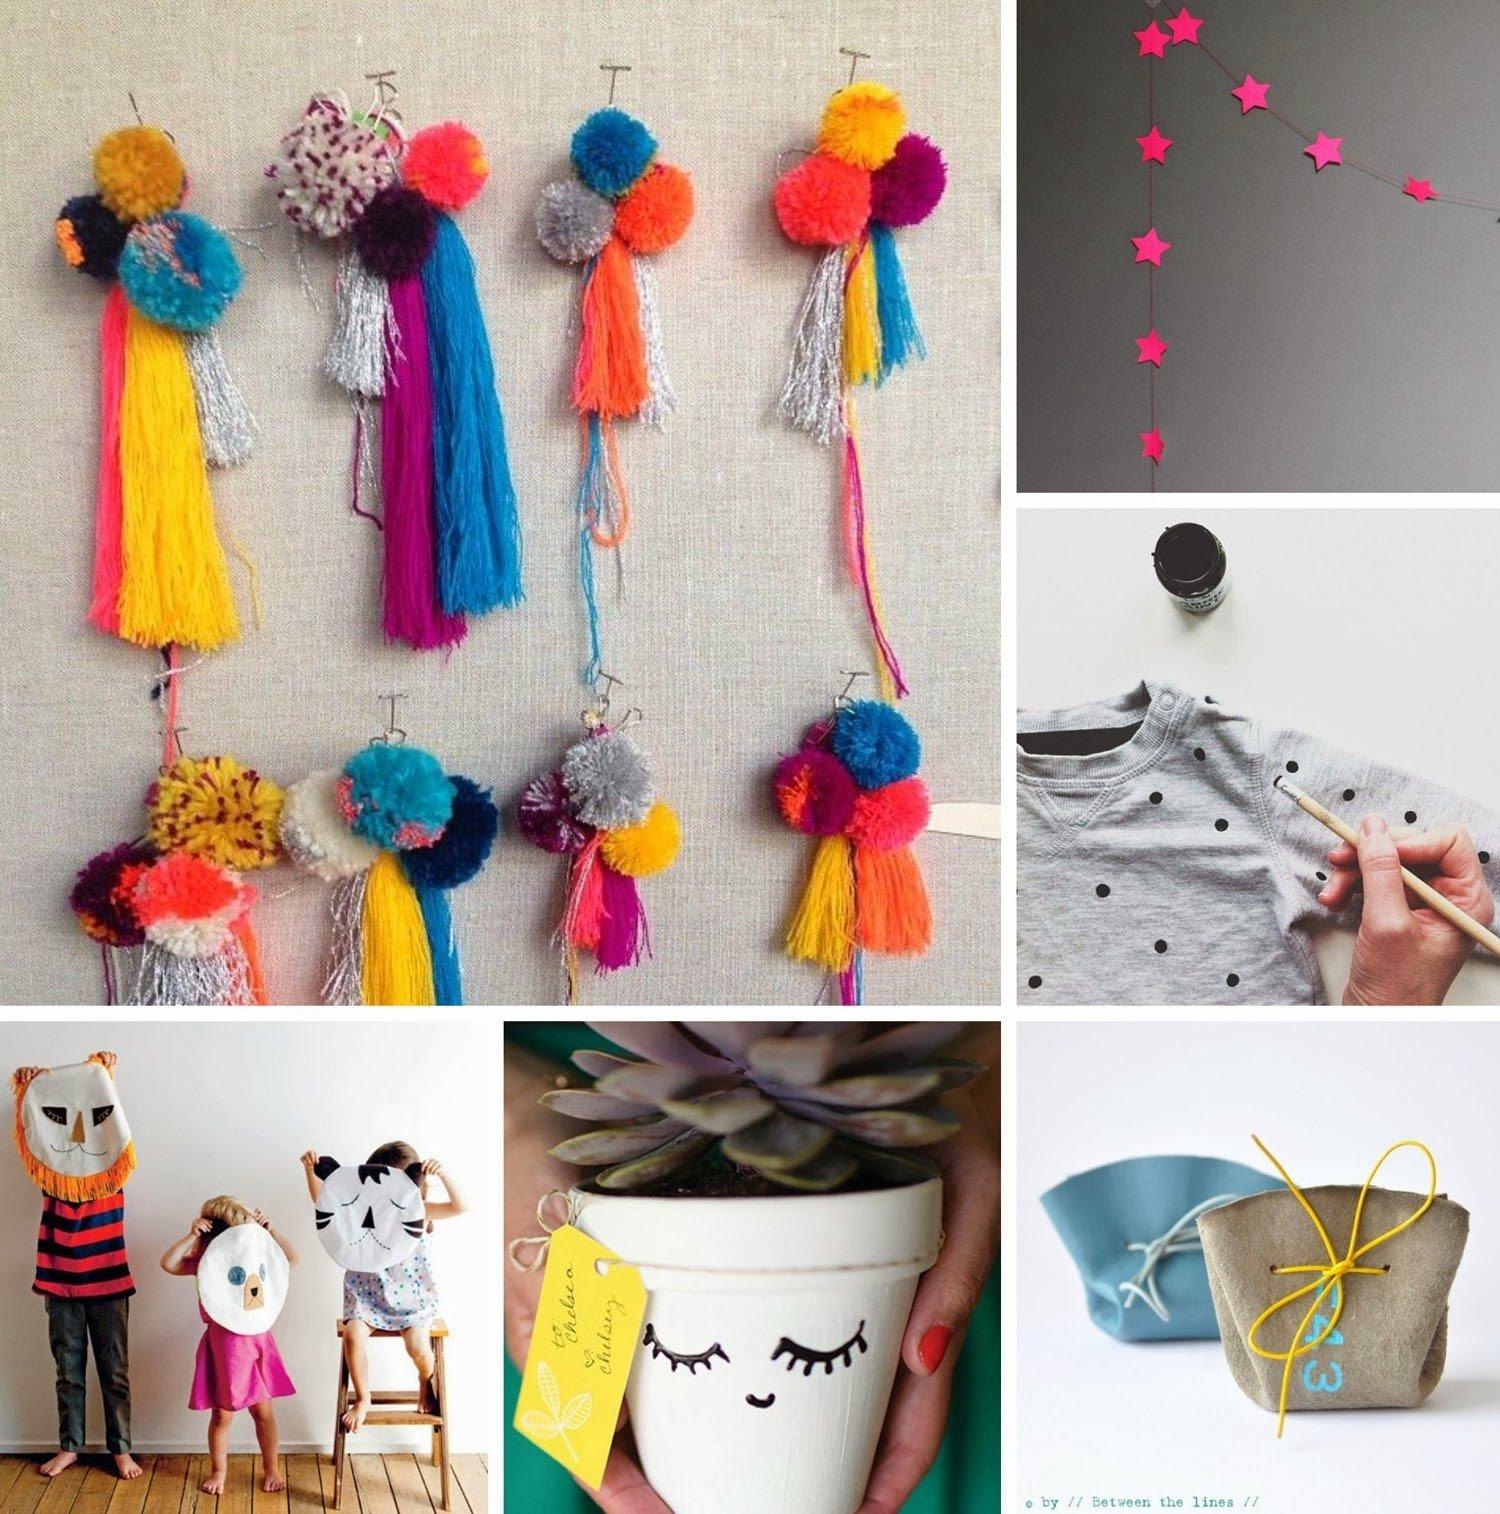 10 Pretty Handmade Gift Ideas For Women moose bird pinboard handmade gift ideas 2020